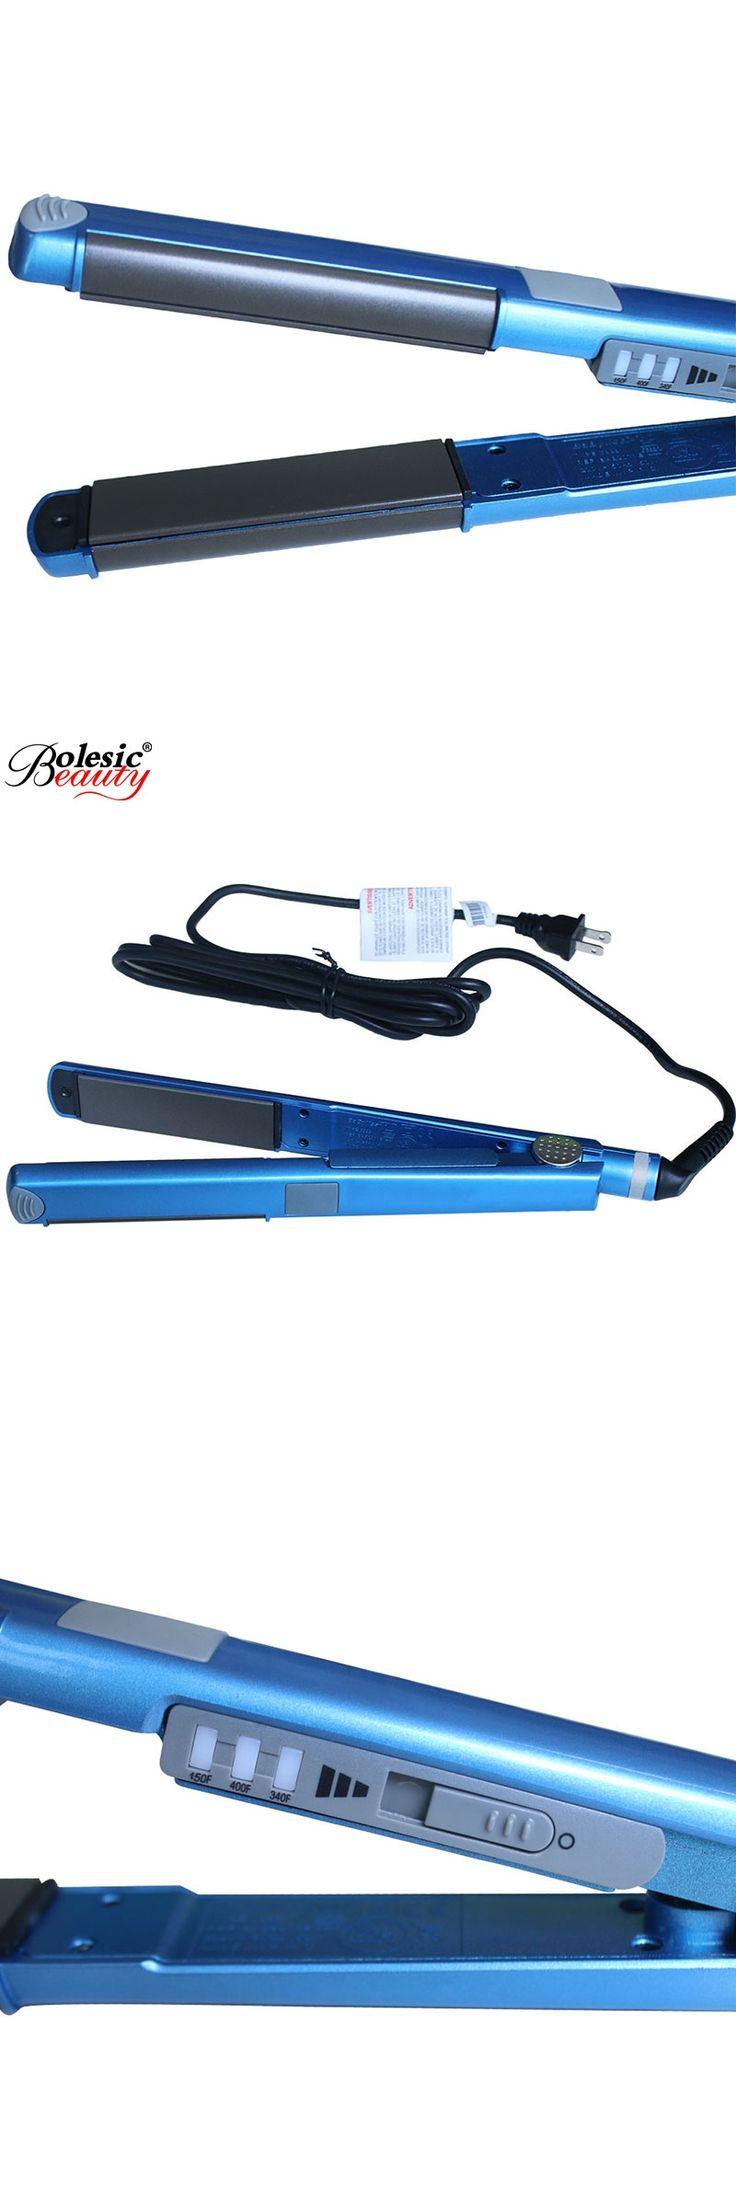 Flat Iron Hair Straightening titanium flat iron professional Plates Styling Tools mini hair straightener EU Plug US Plug